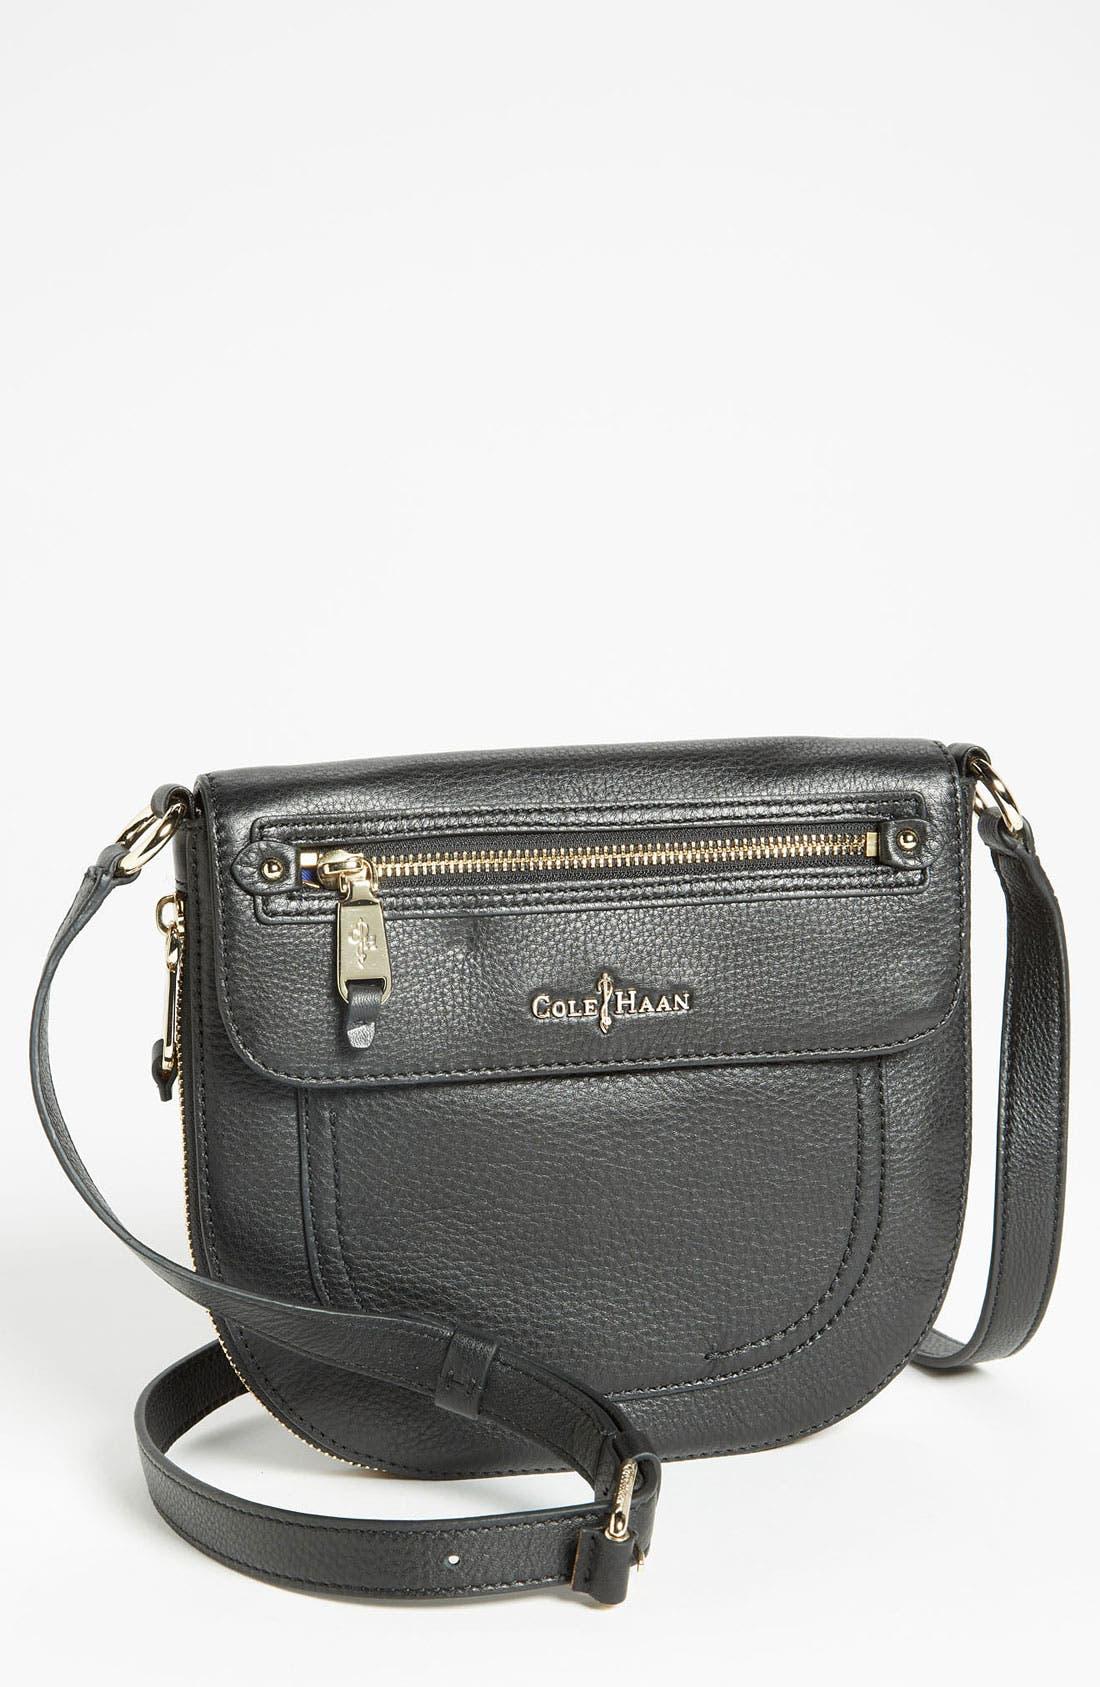 Main Image - Cole Haan 'Canteen' Crossbody Bag